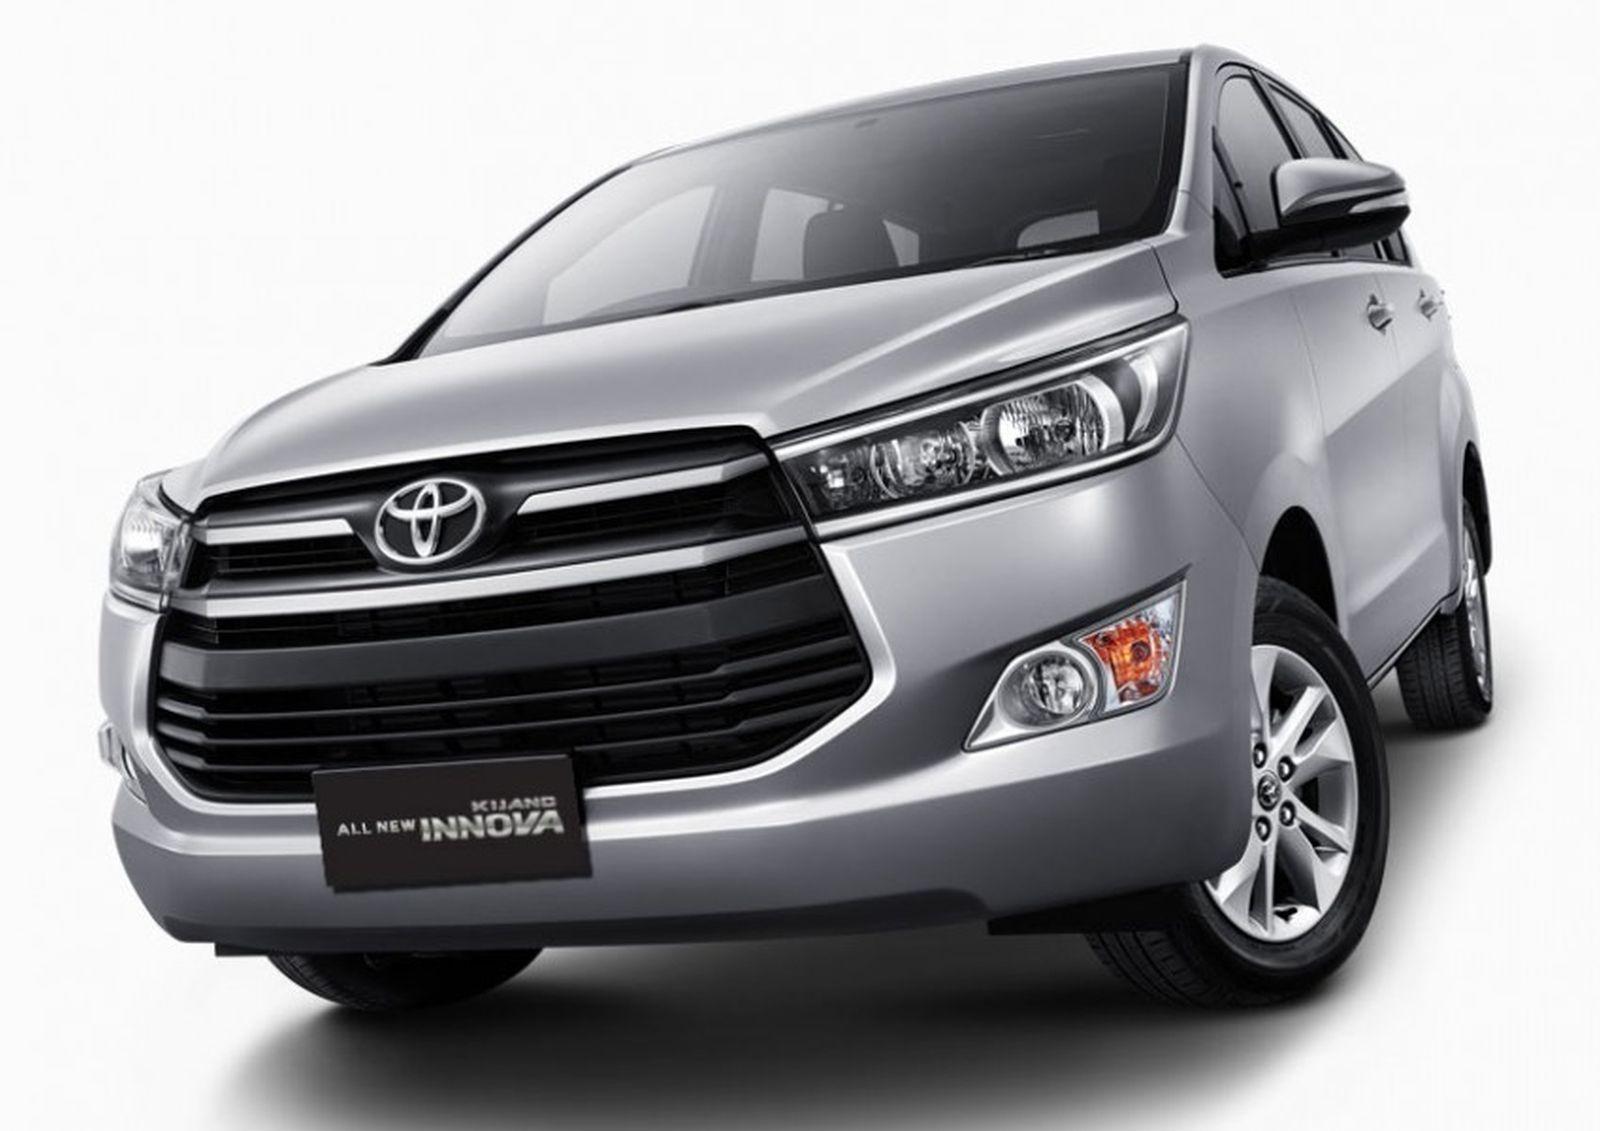 Pin By Motordestination On Toyota Innova 2016 Toyota Innova New Upcoming Cars New Cars